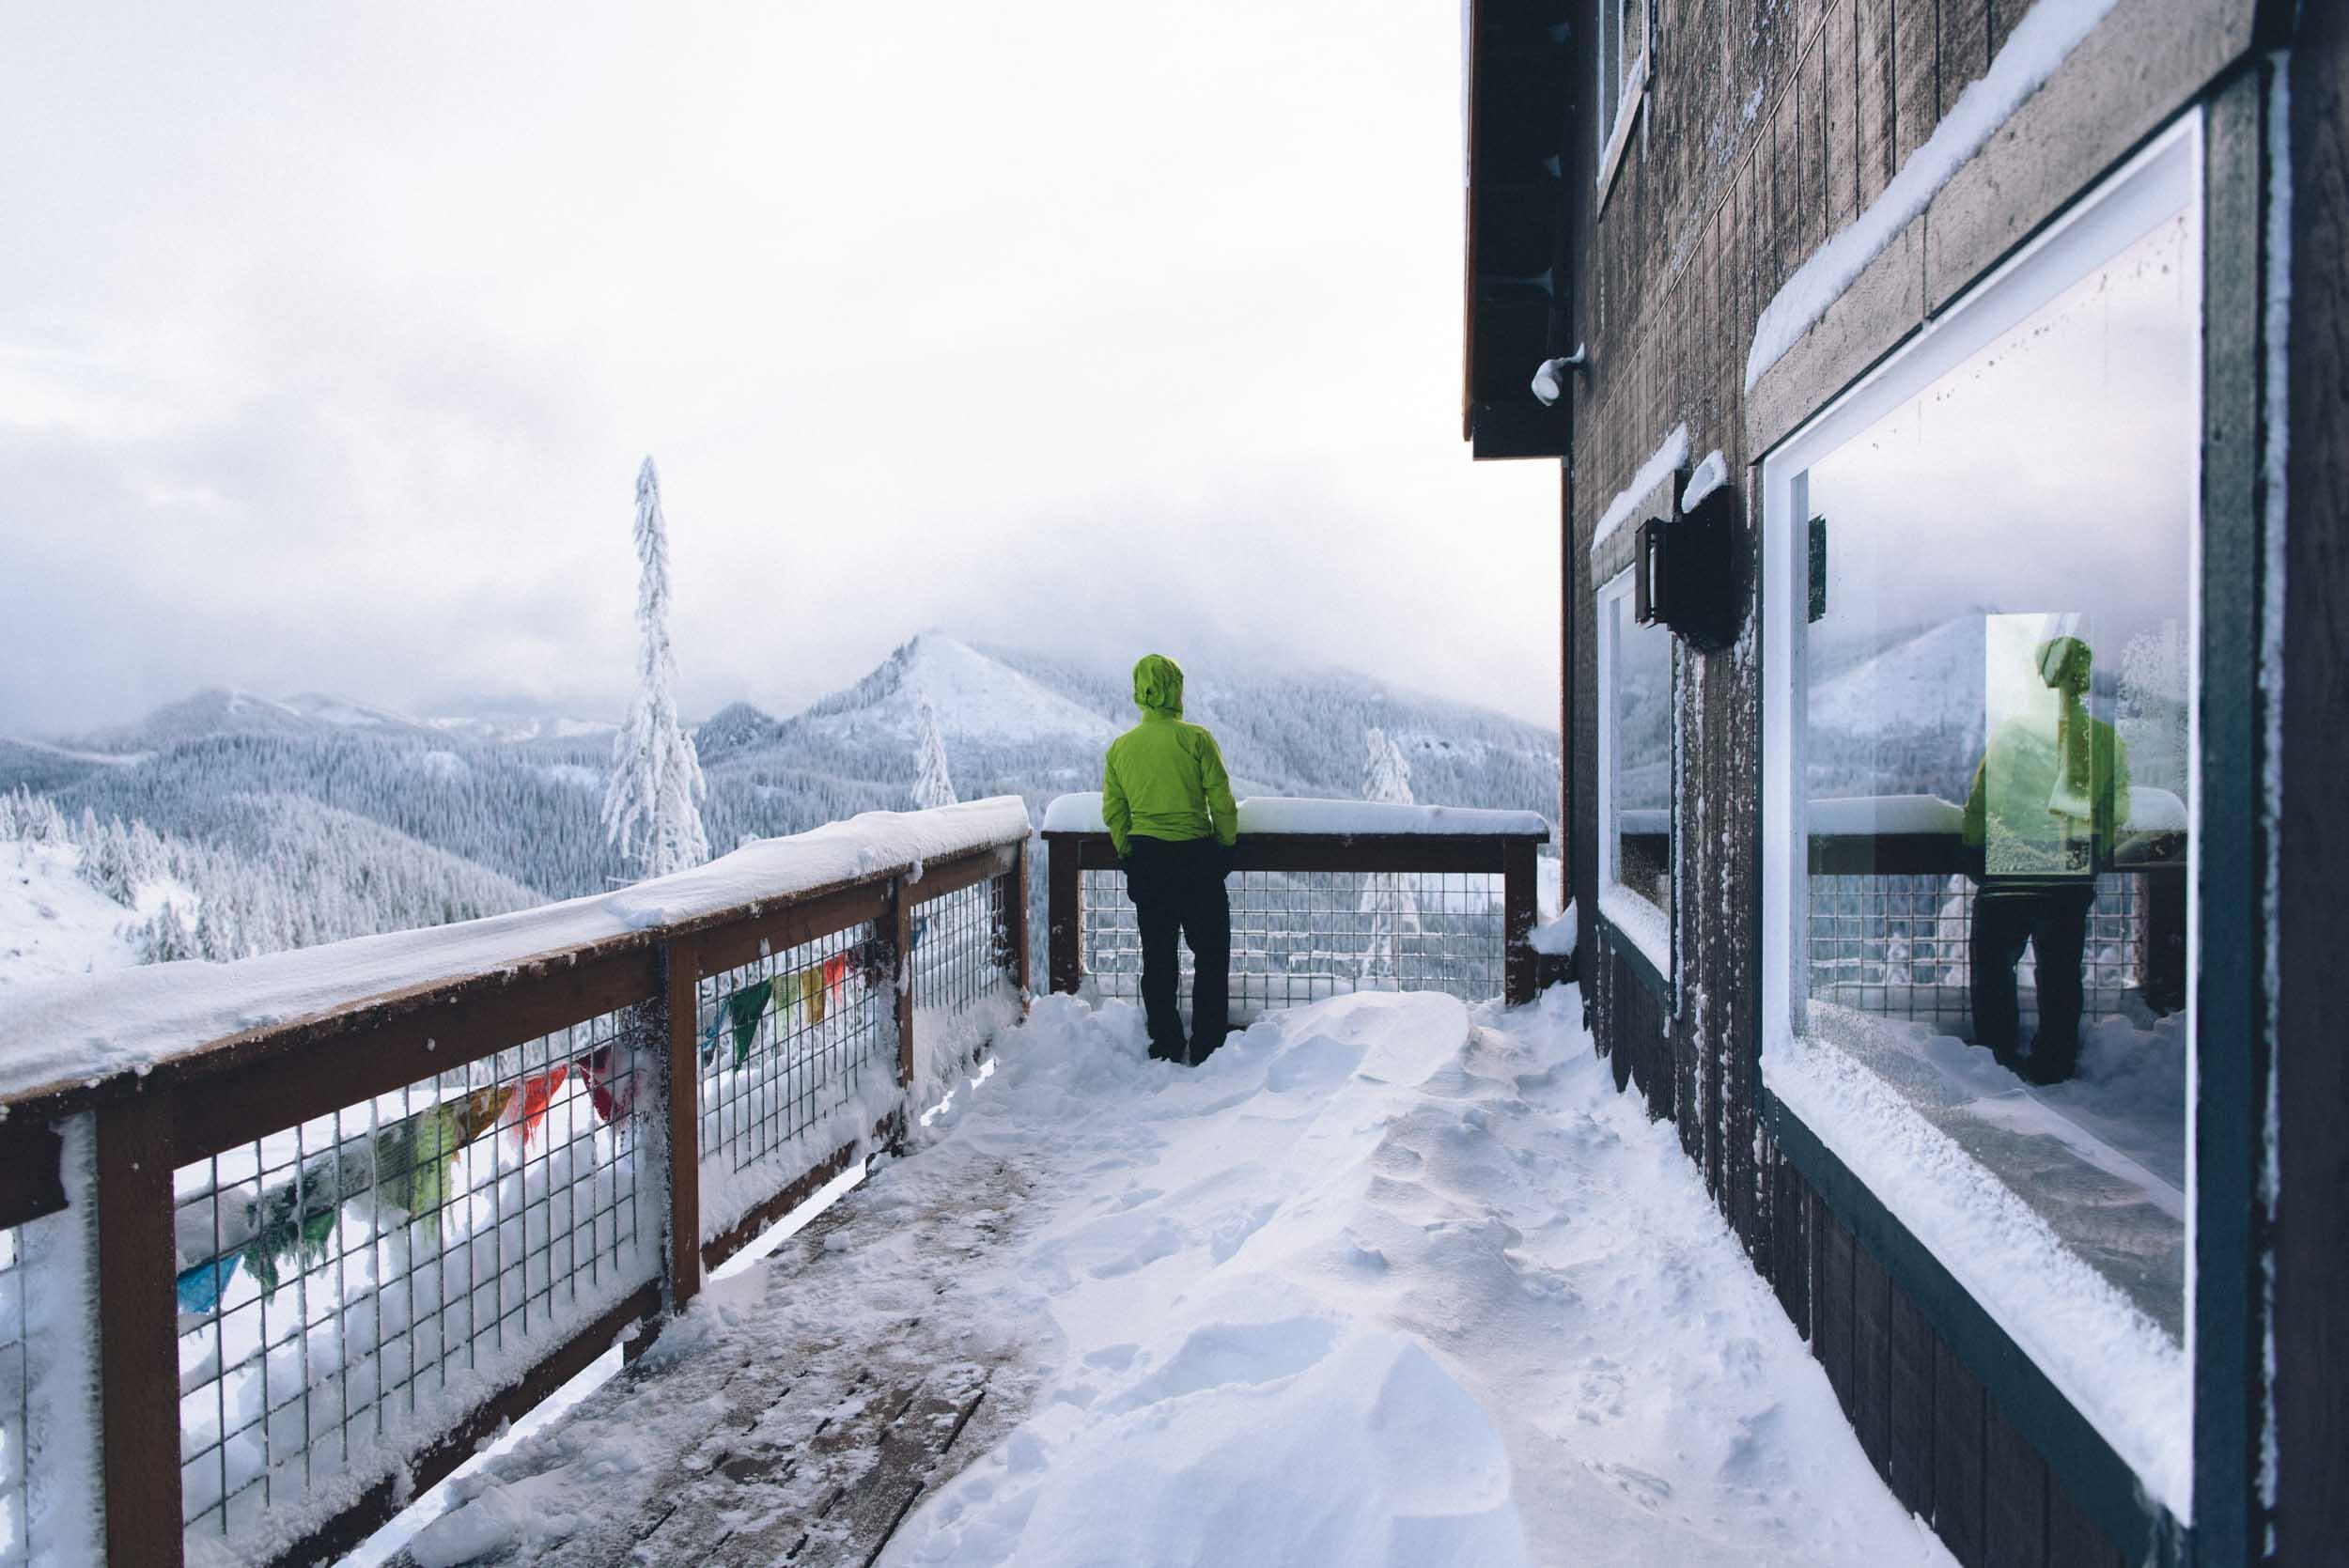 Miriam-Subbiah-Snow-Bowl-Hut-15.jpg